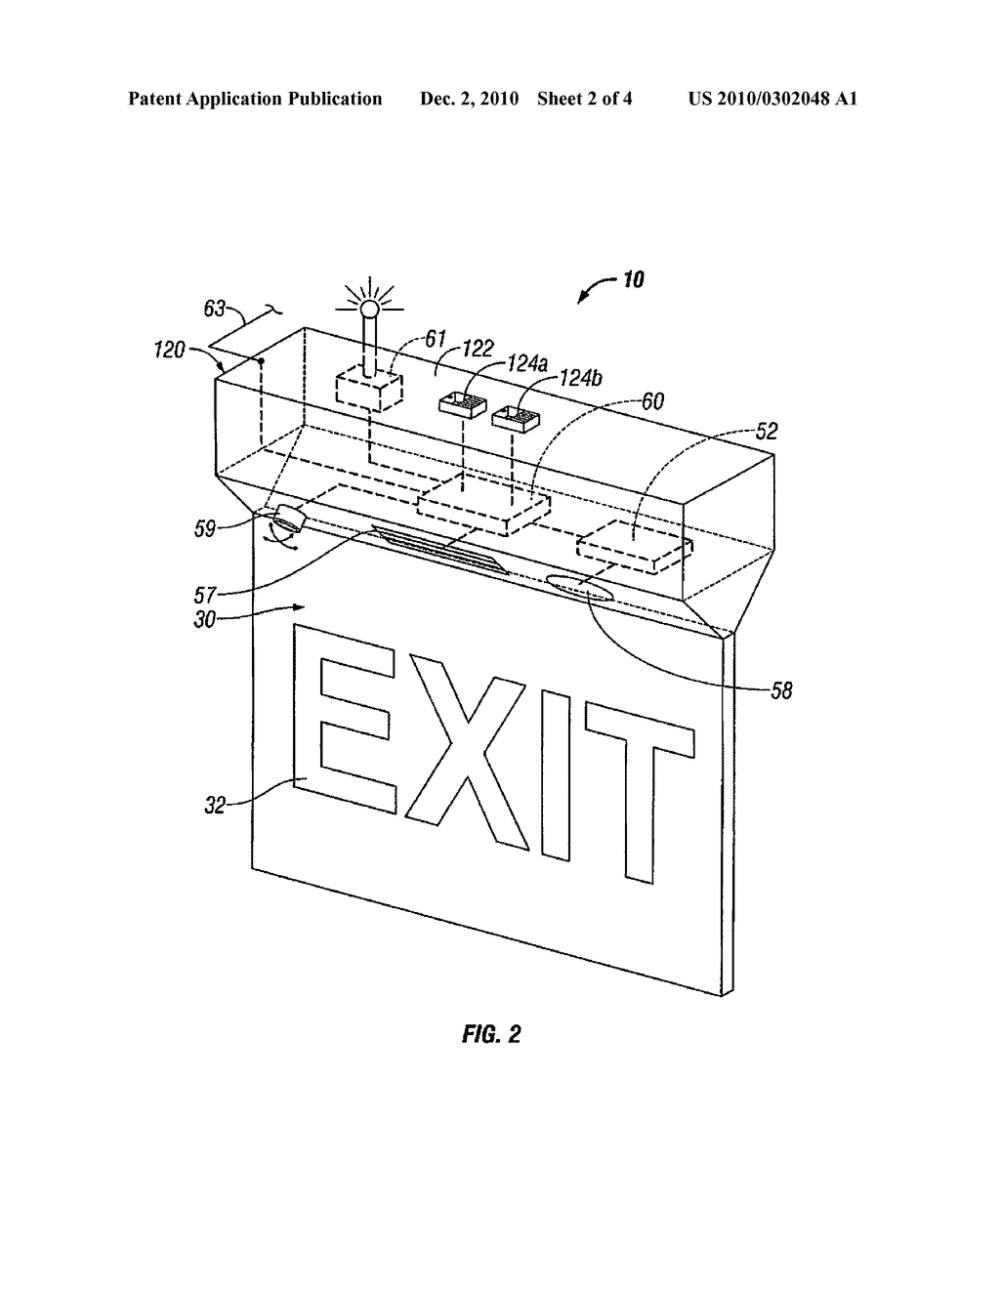 medium resolution of exit sign schematic wiring diagram todaysintelligent exit sign diagram schematic and image 03 exit